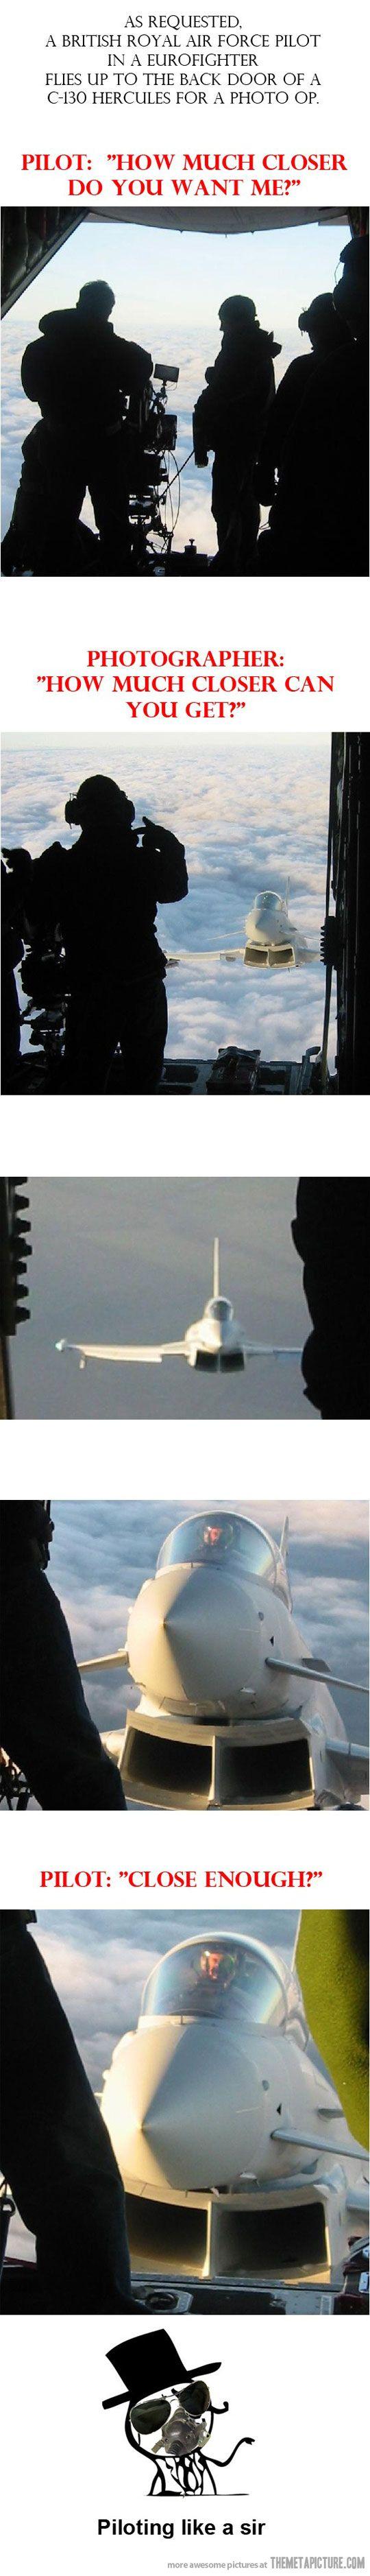 funny-jet-plane-close-up-photo